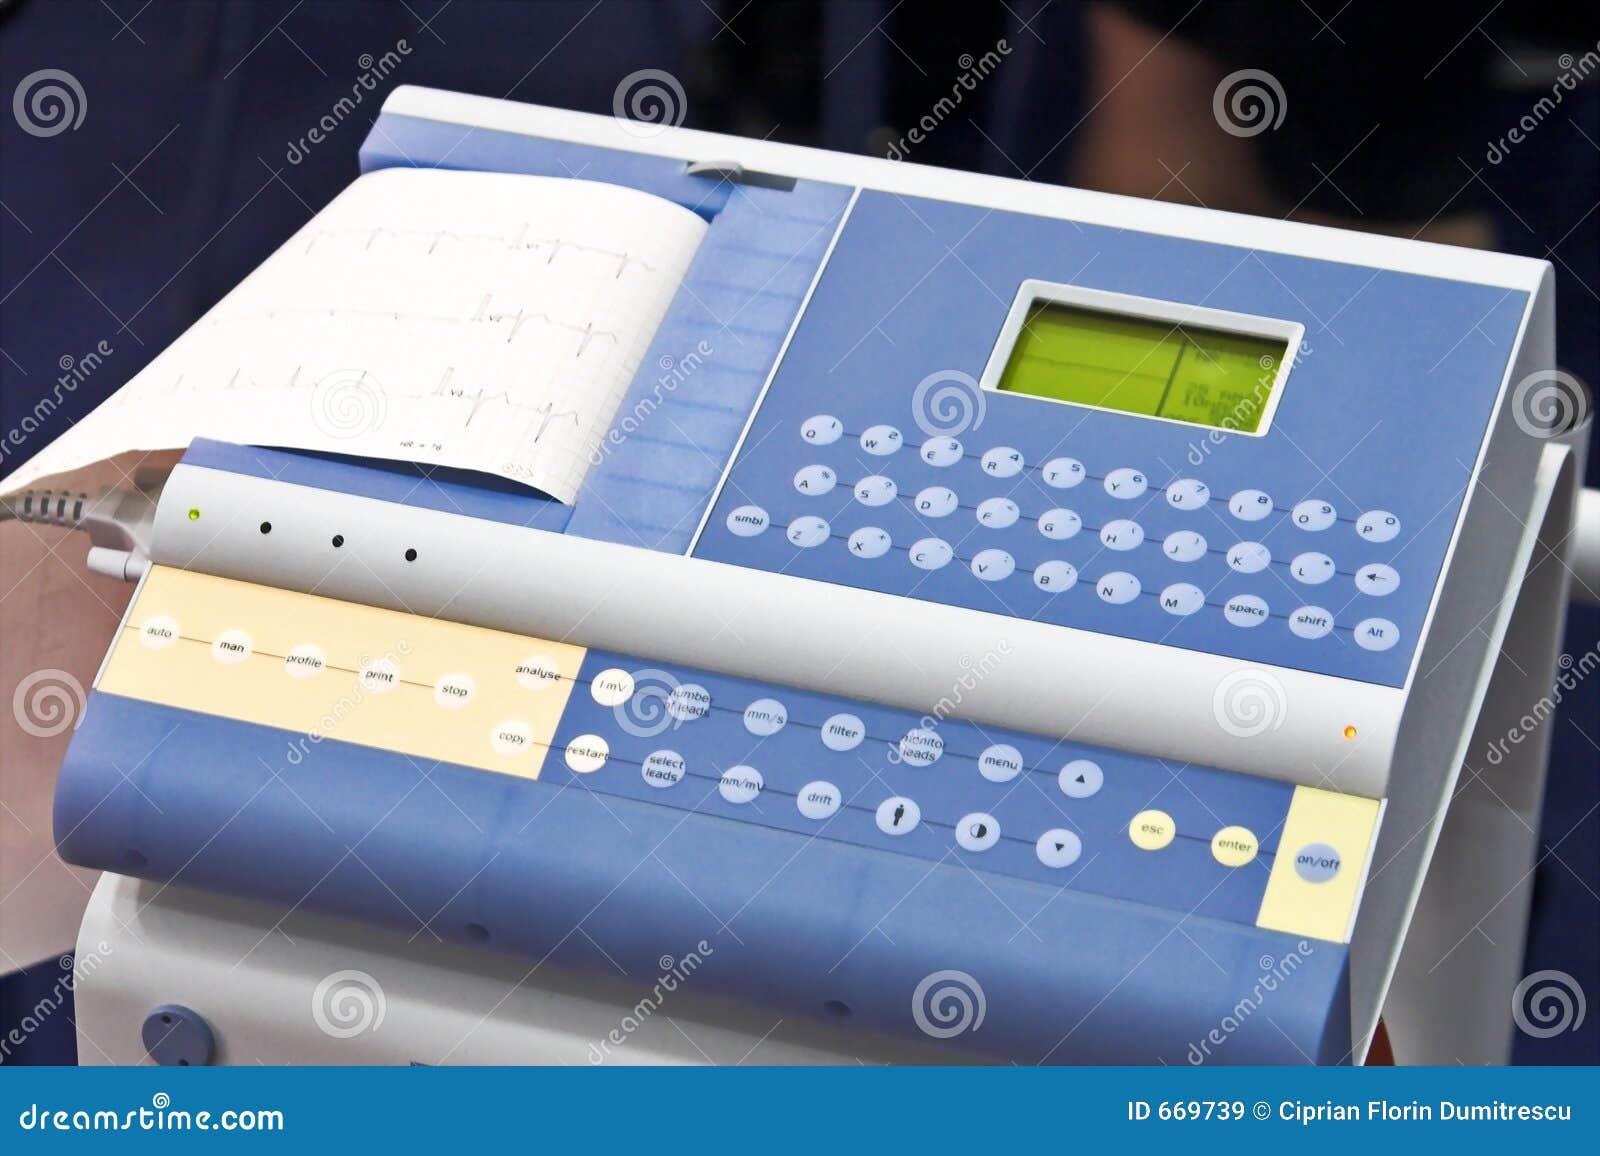 modern ekg machine stock image image of analyse hospital 669739. Black Bedroom Furniture Sets. Home Design Ideas